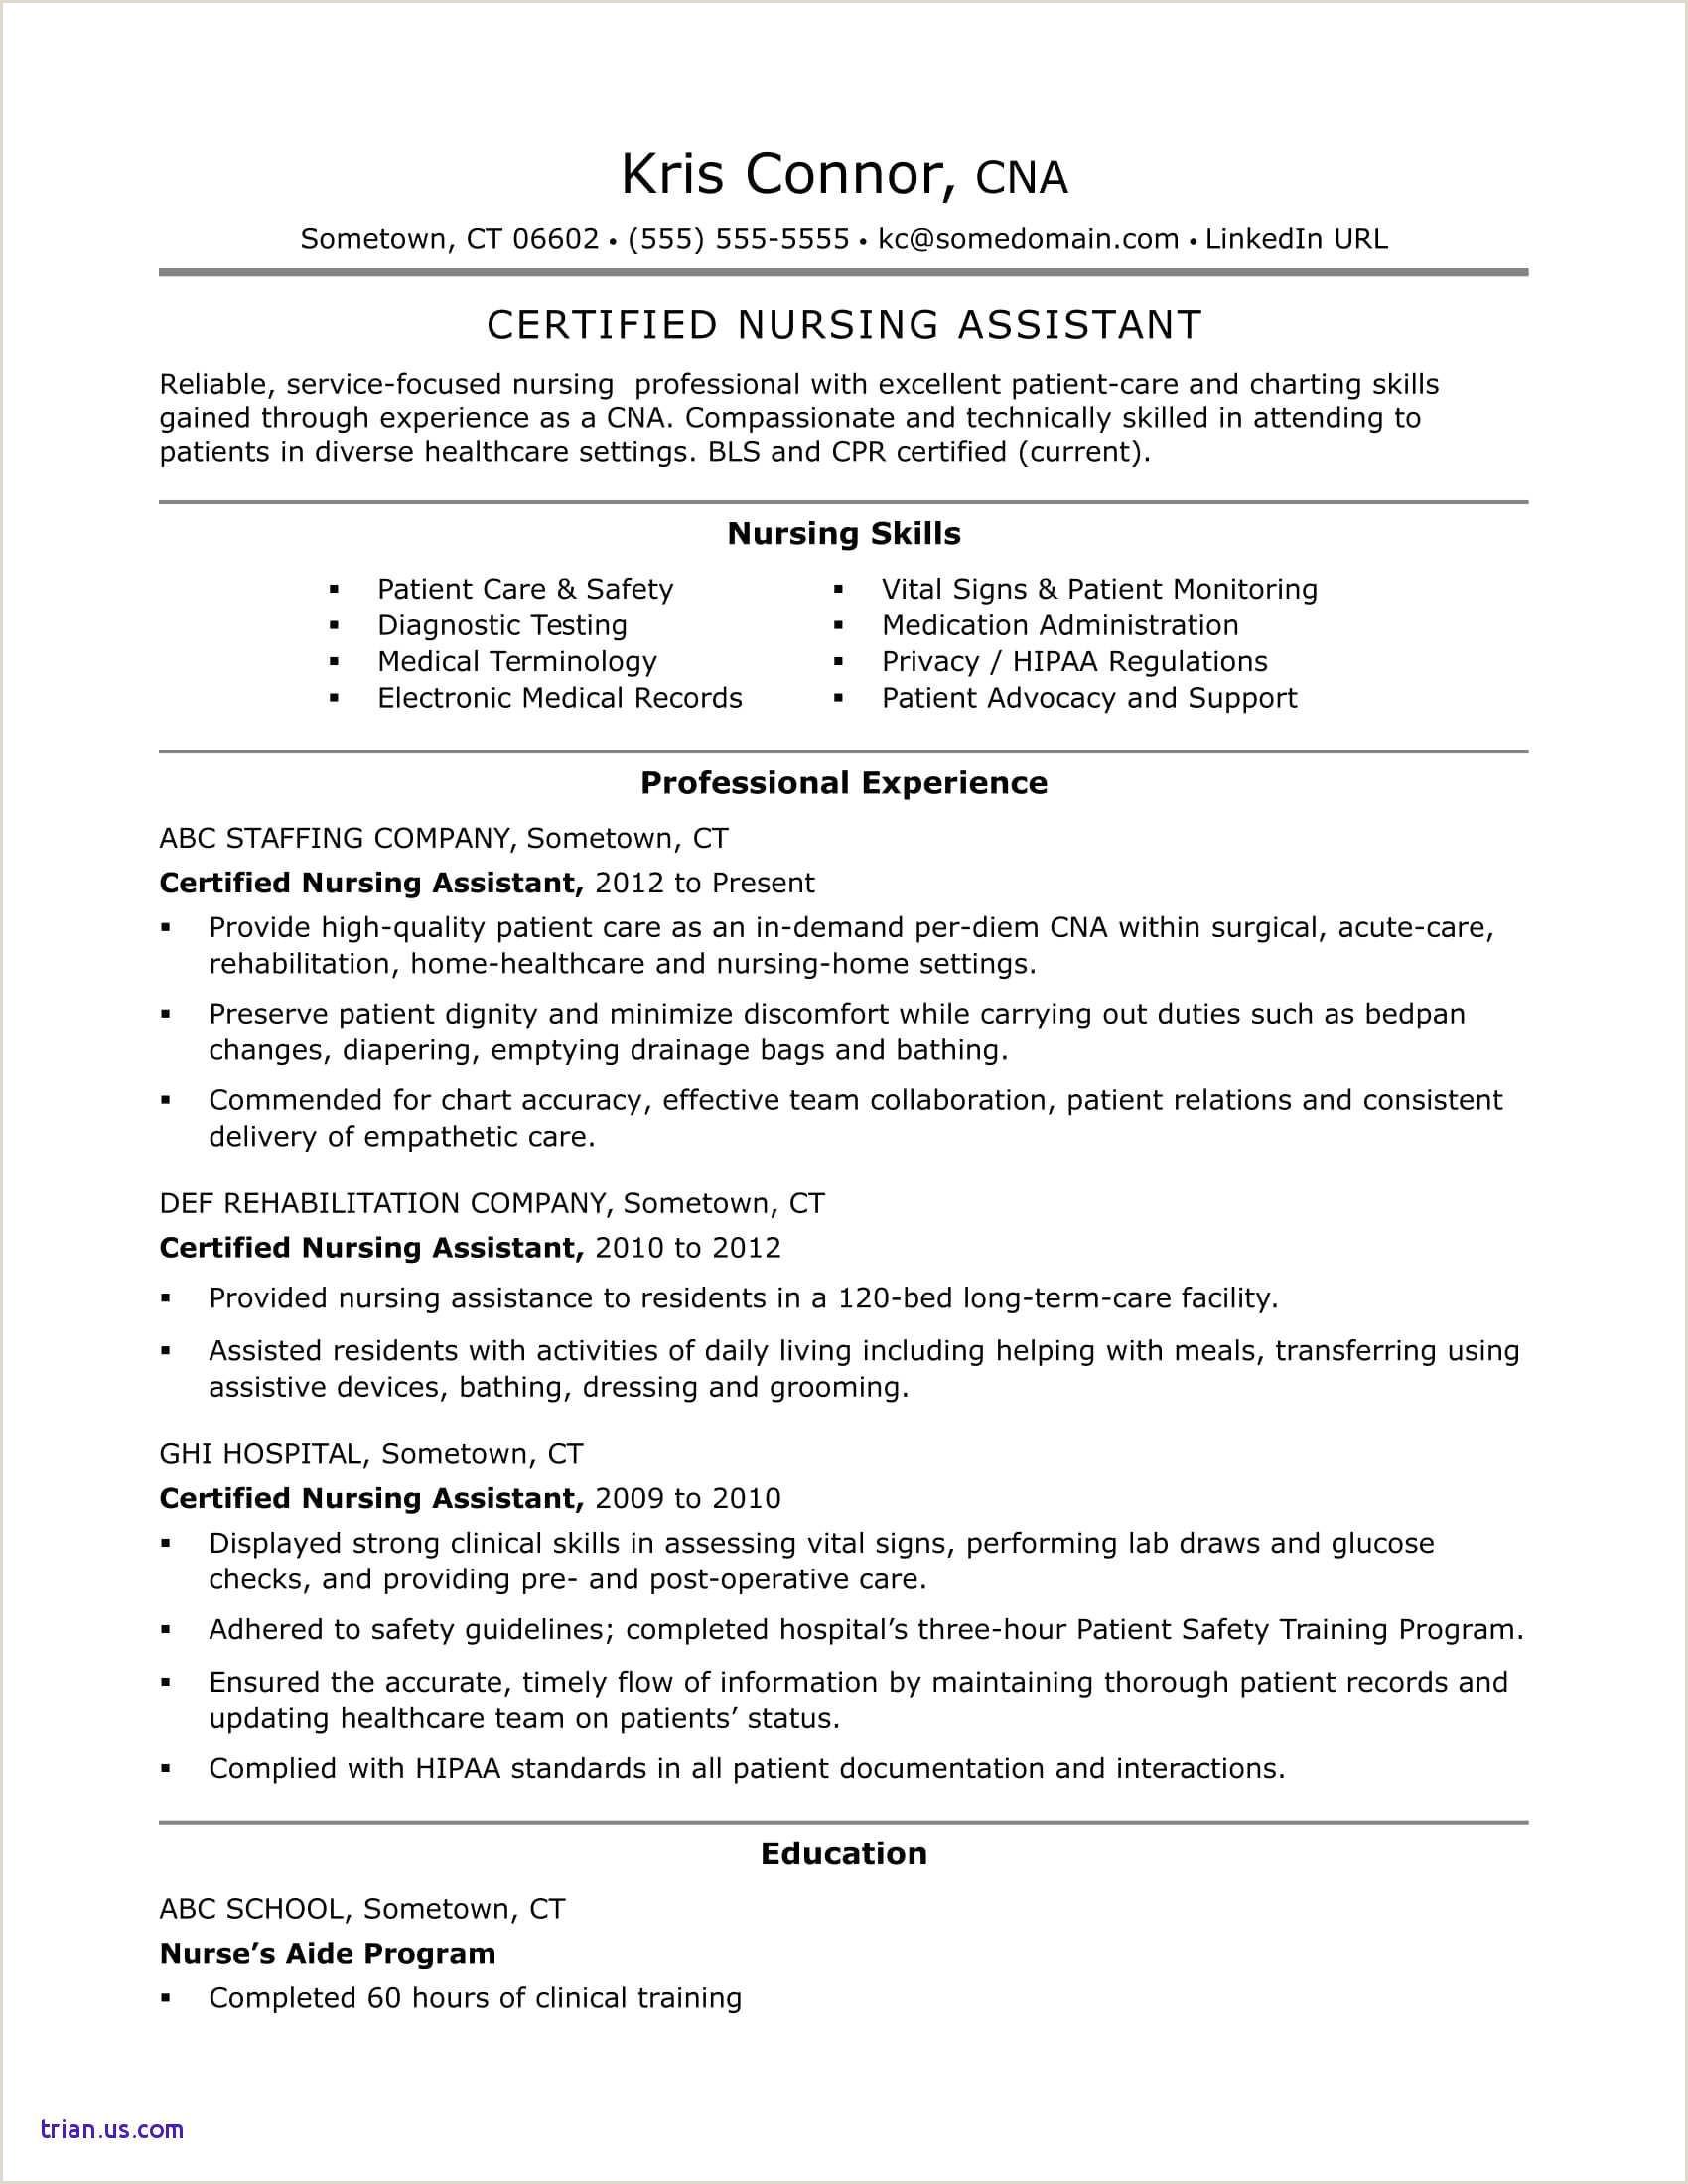 Professional Cv format for Nurses 8 Nursing assistant Resume Examples Examples